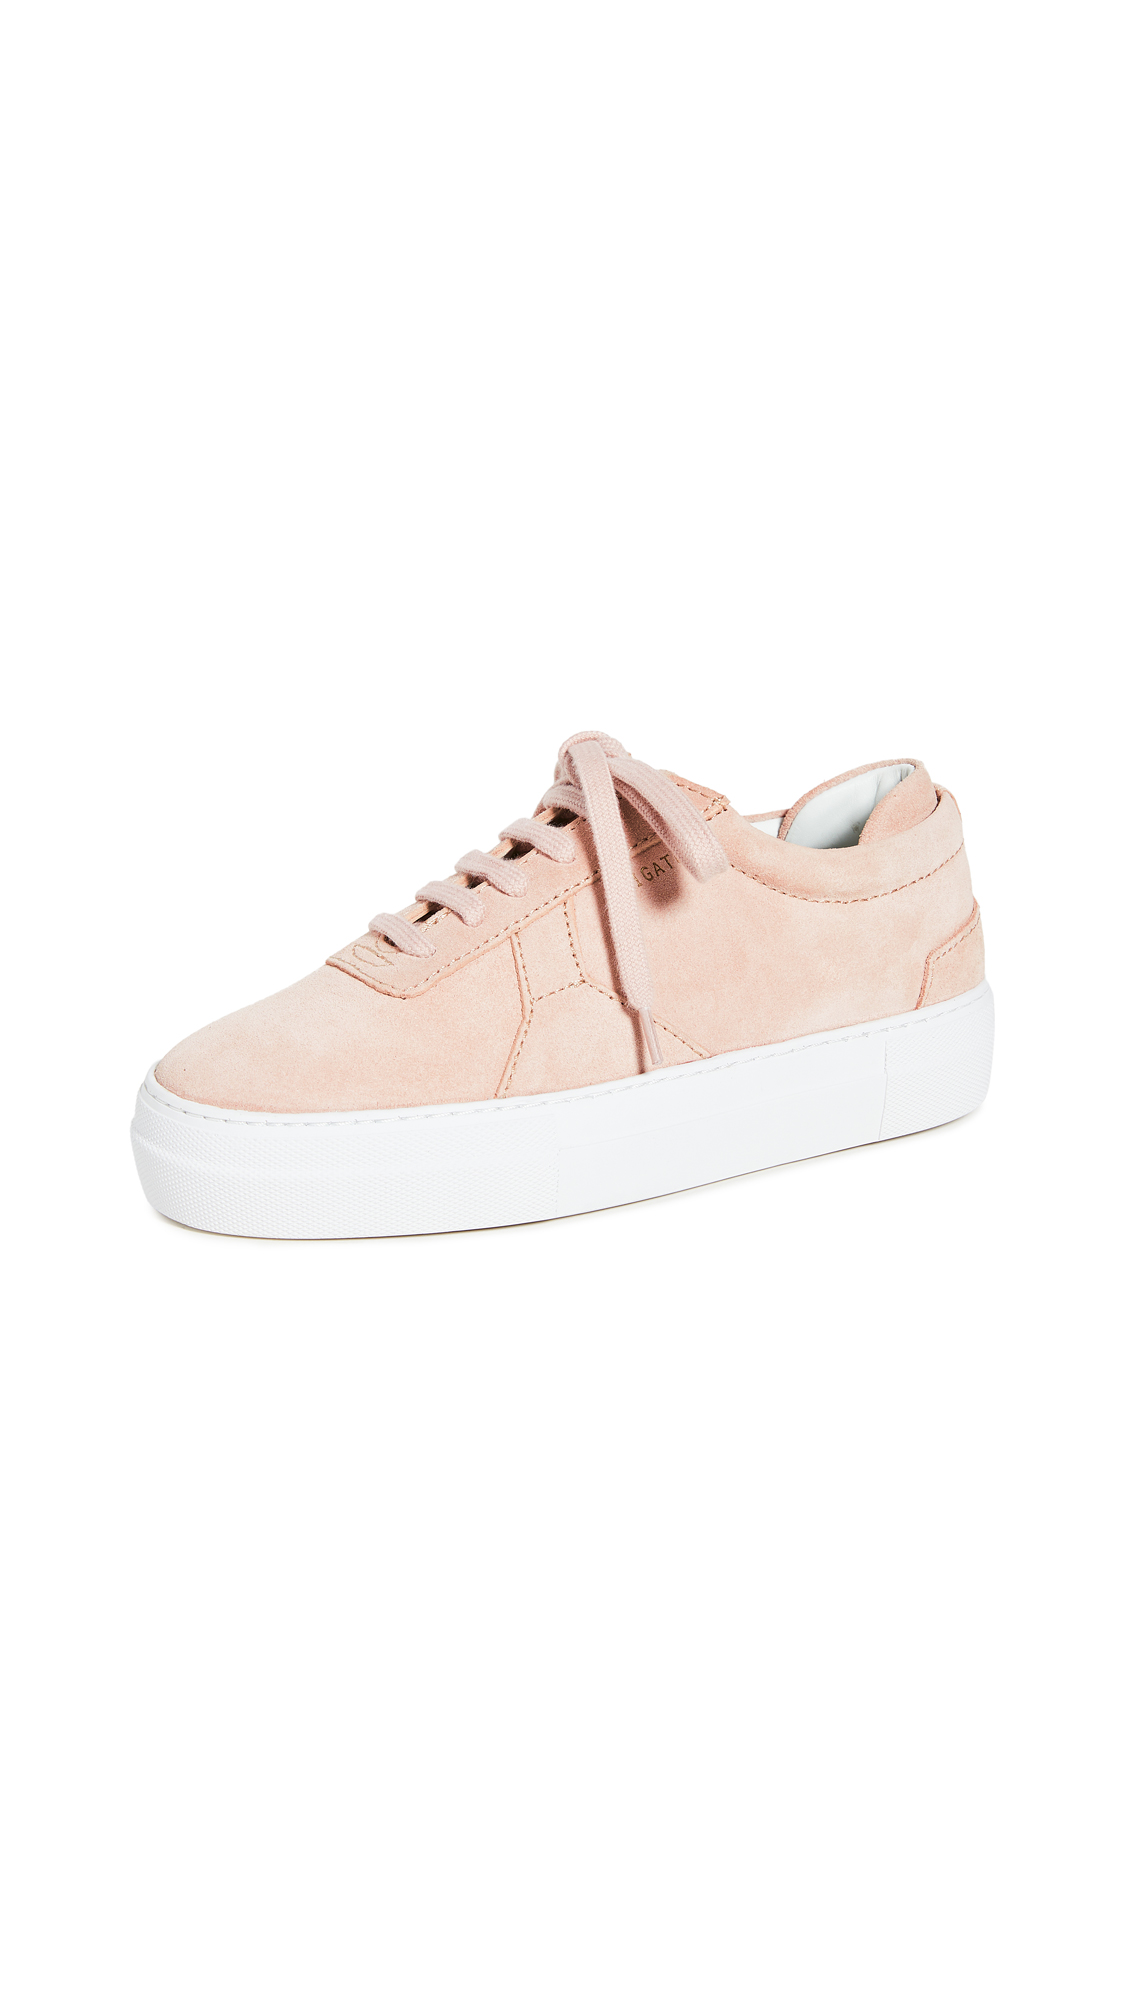 Buy Axel Arigato online - photo of Axel Arigato Platform Sneakers